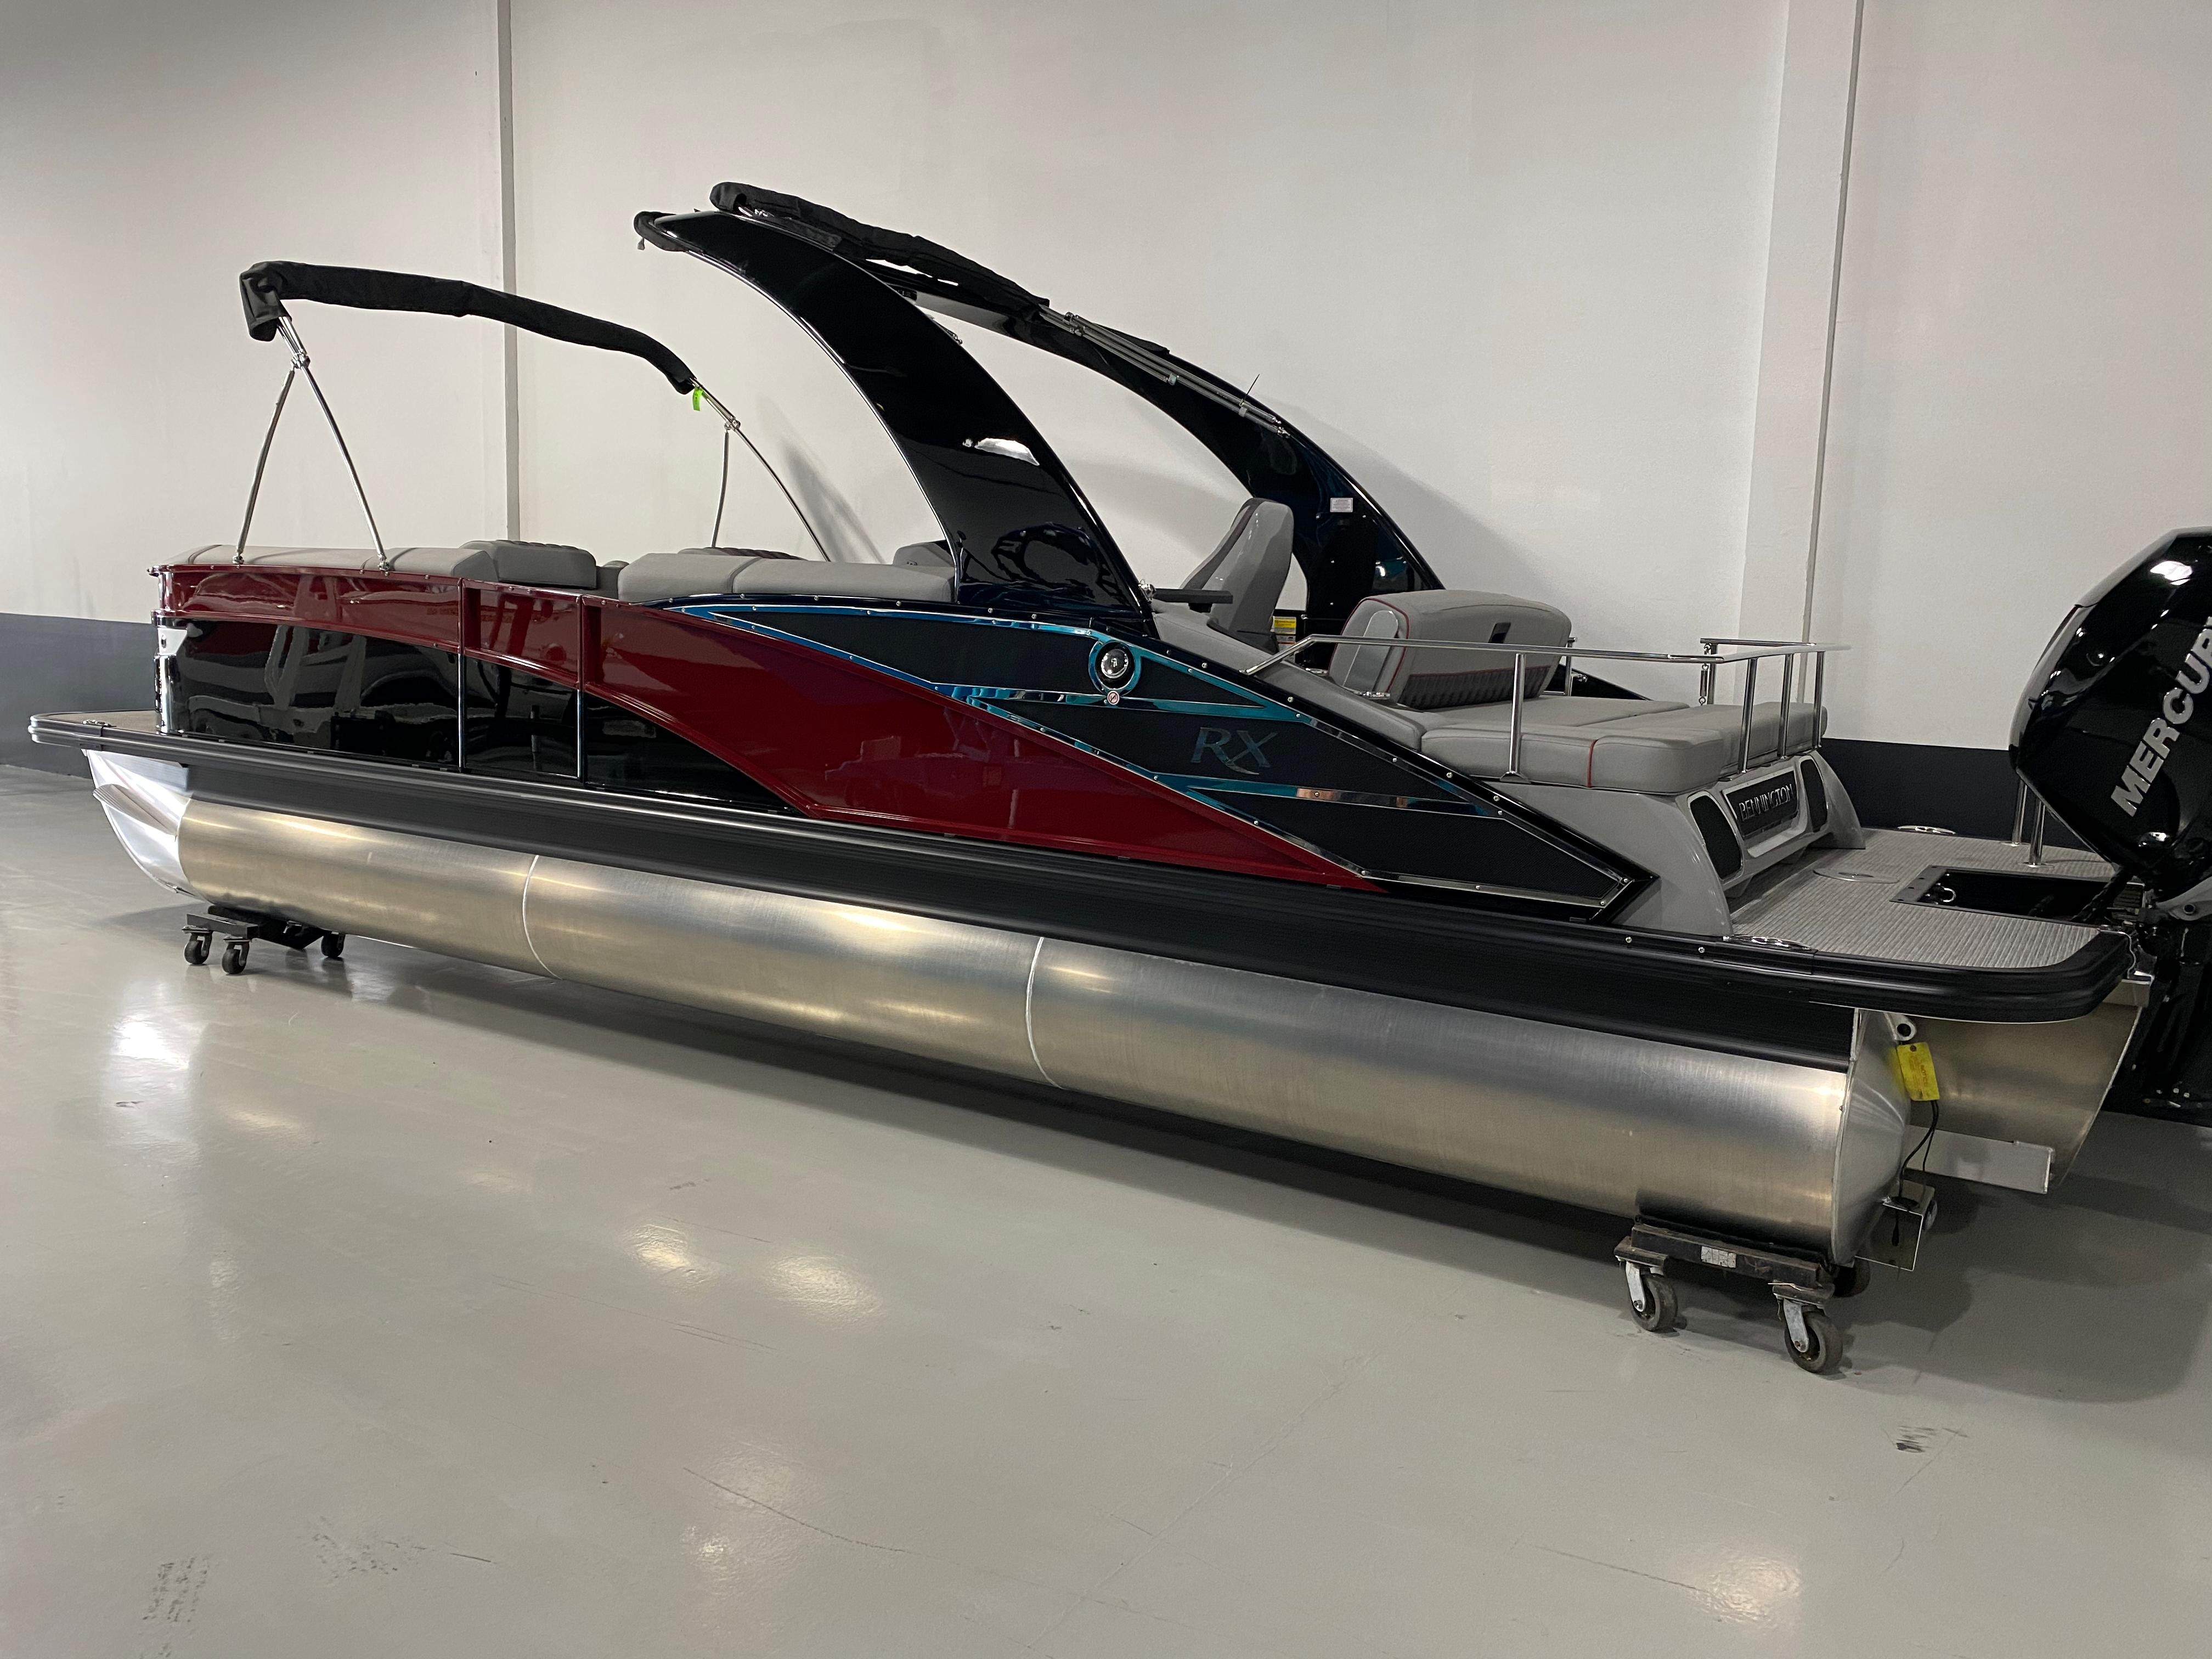 2021 Bennington 25 RXSBA #B8400A inventory image at Sun Country Inland in Lake Havasu City